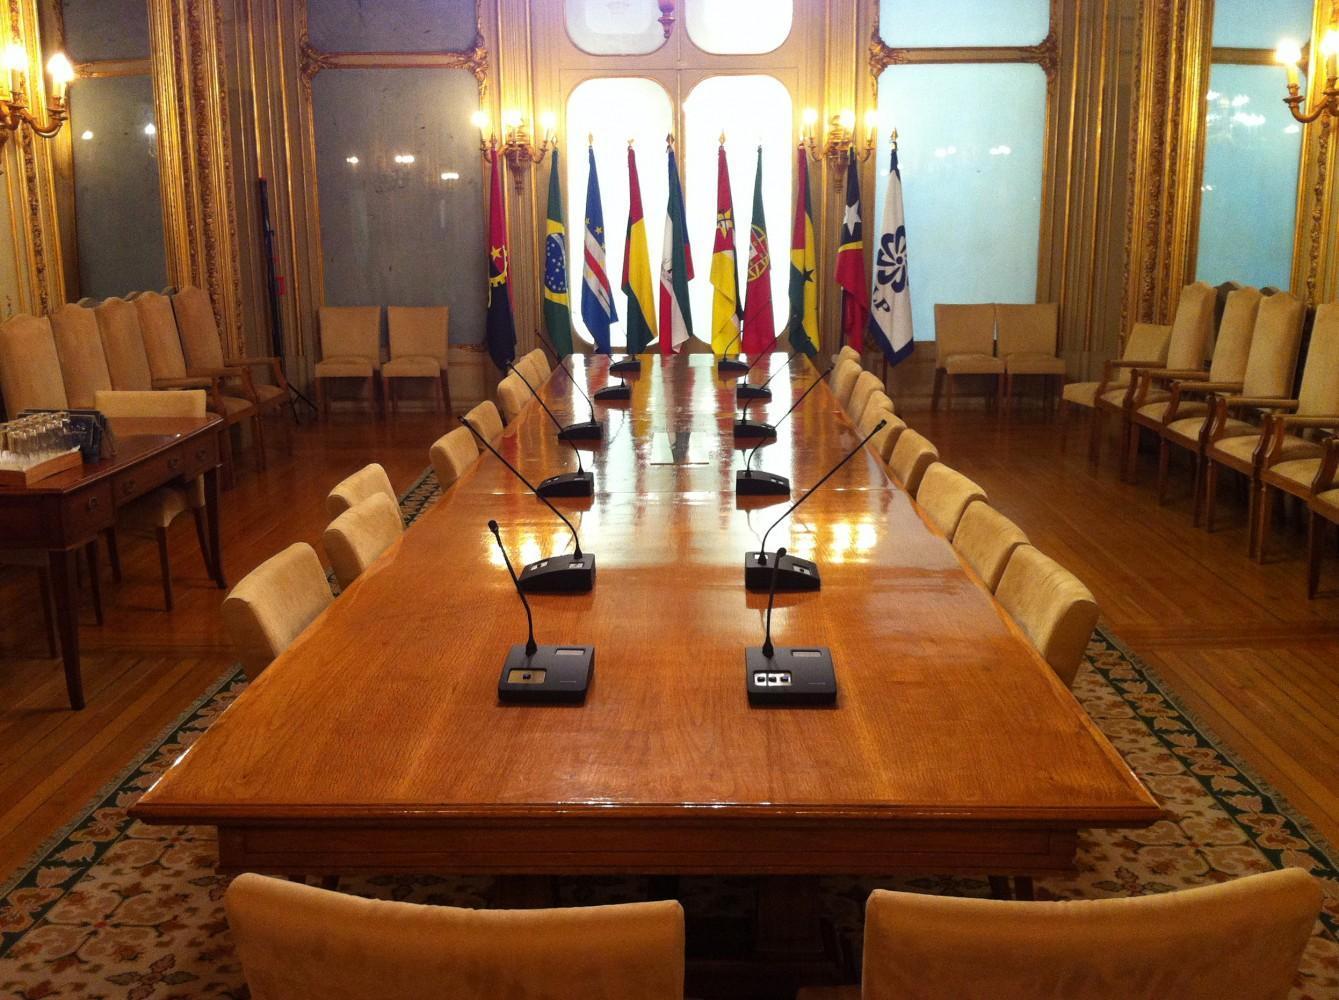 Salão Principal da sede da CPLP lx